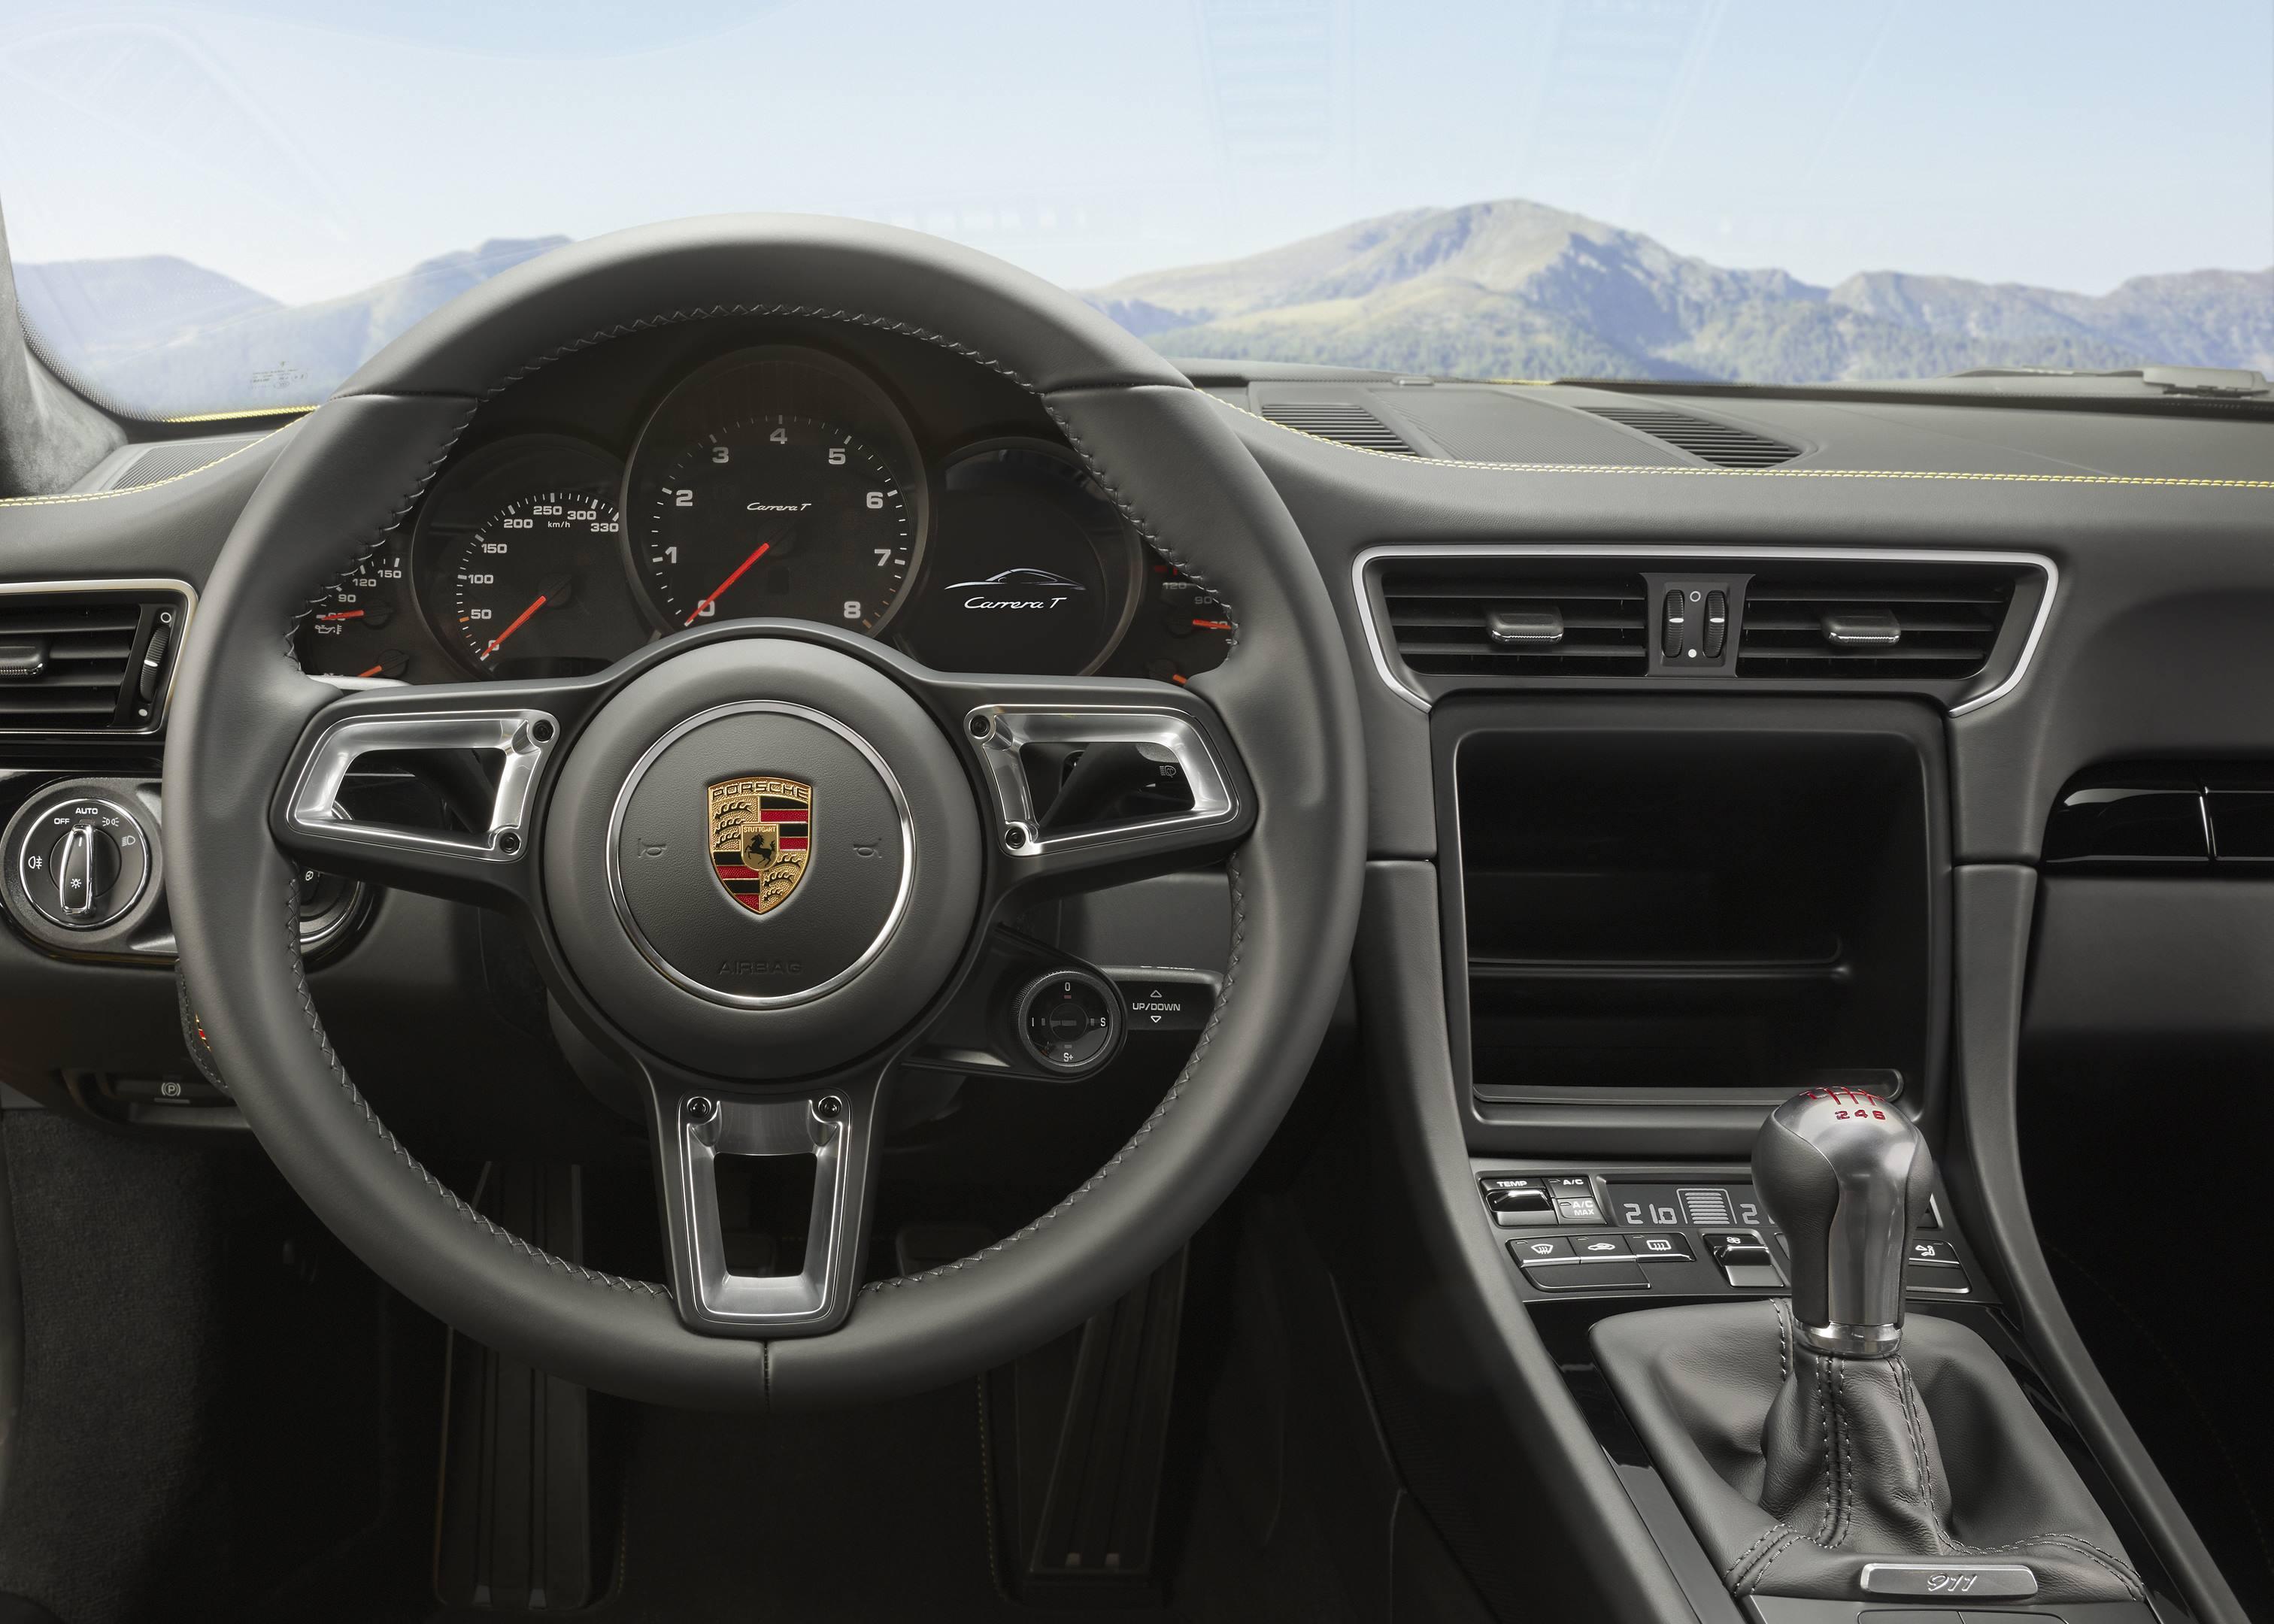 2018 Porsche 911 Carrera T dash